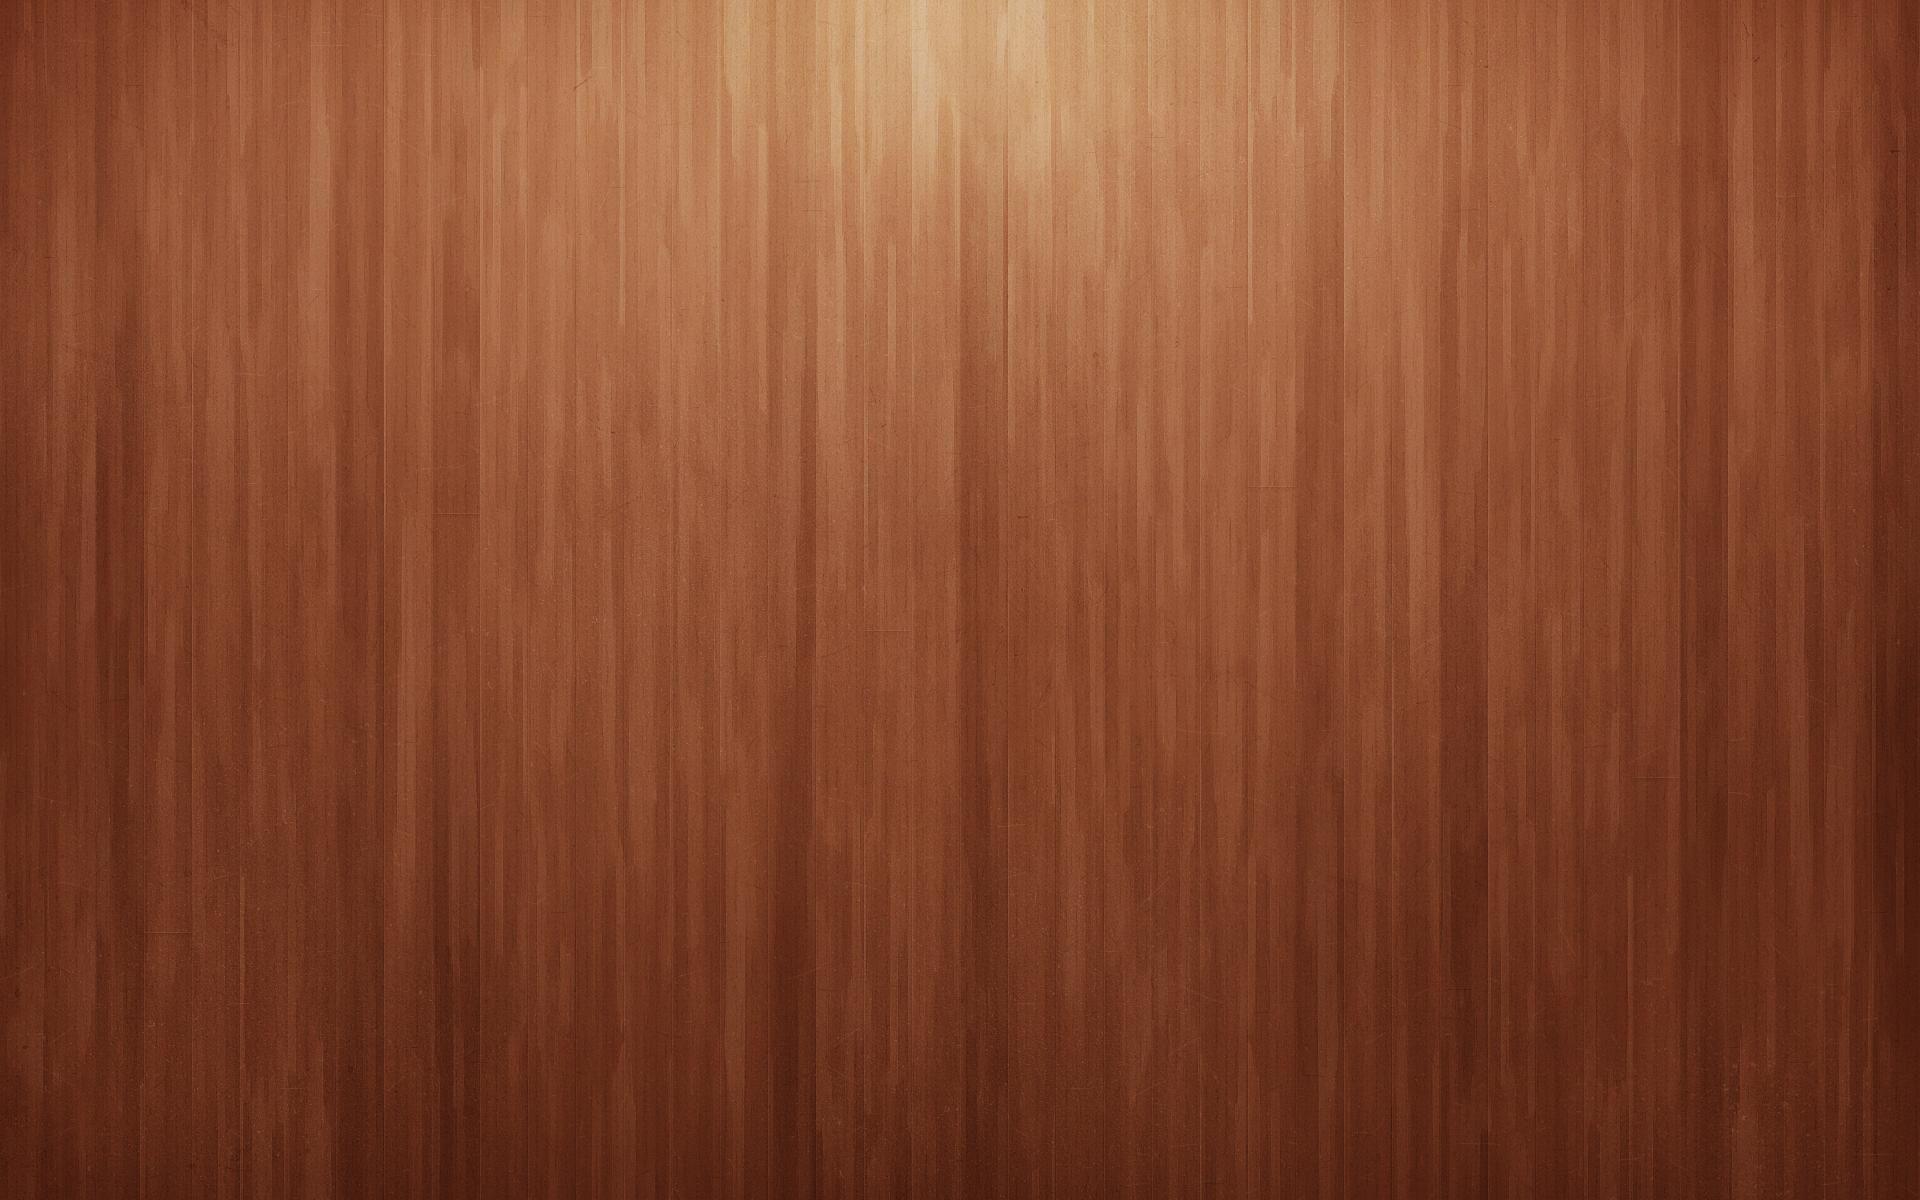 Hd wallpaper wood - Wood Hd Wallpapers Backgrounds Wallpaper 1920 1200 Wood Wallpaper Hd 41 Wallpapers